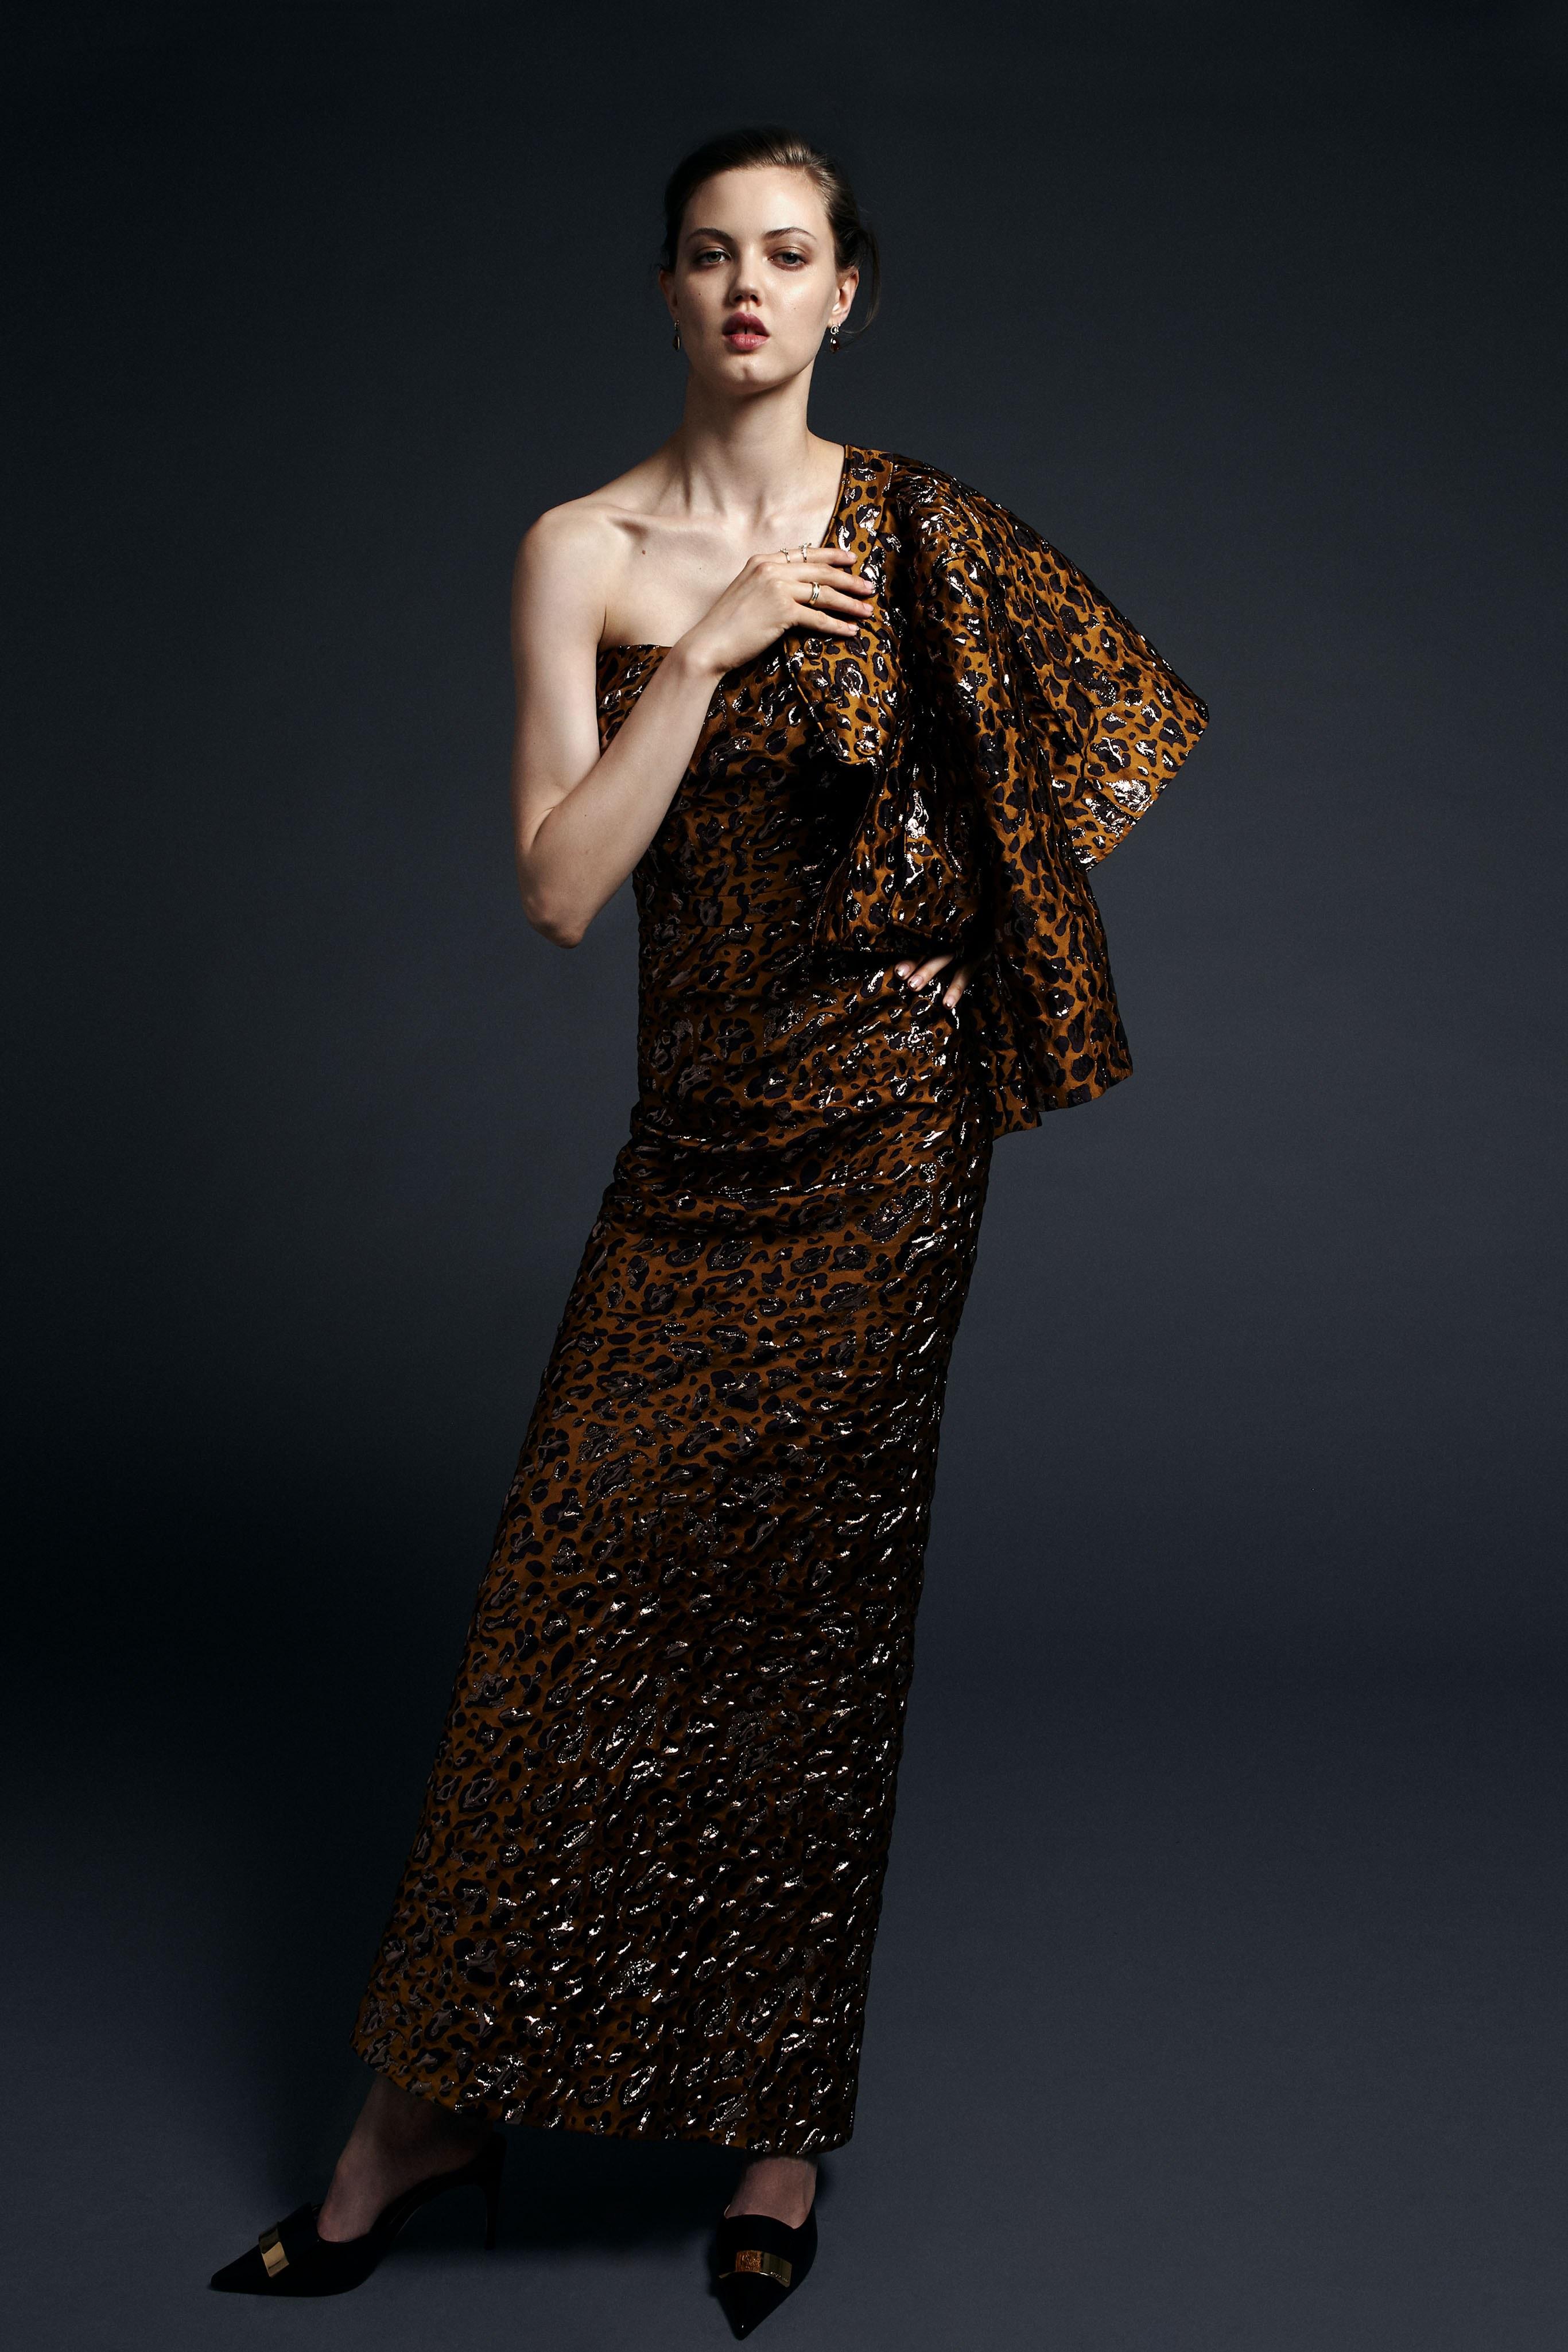 Modetrends goldene Idee